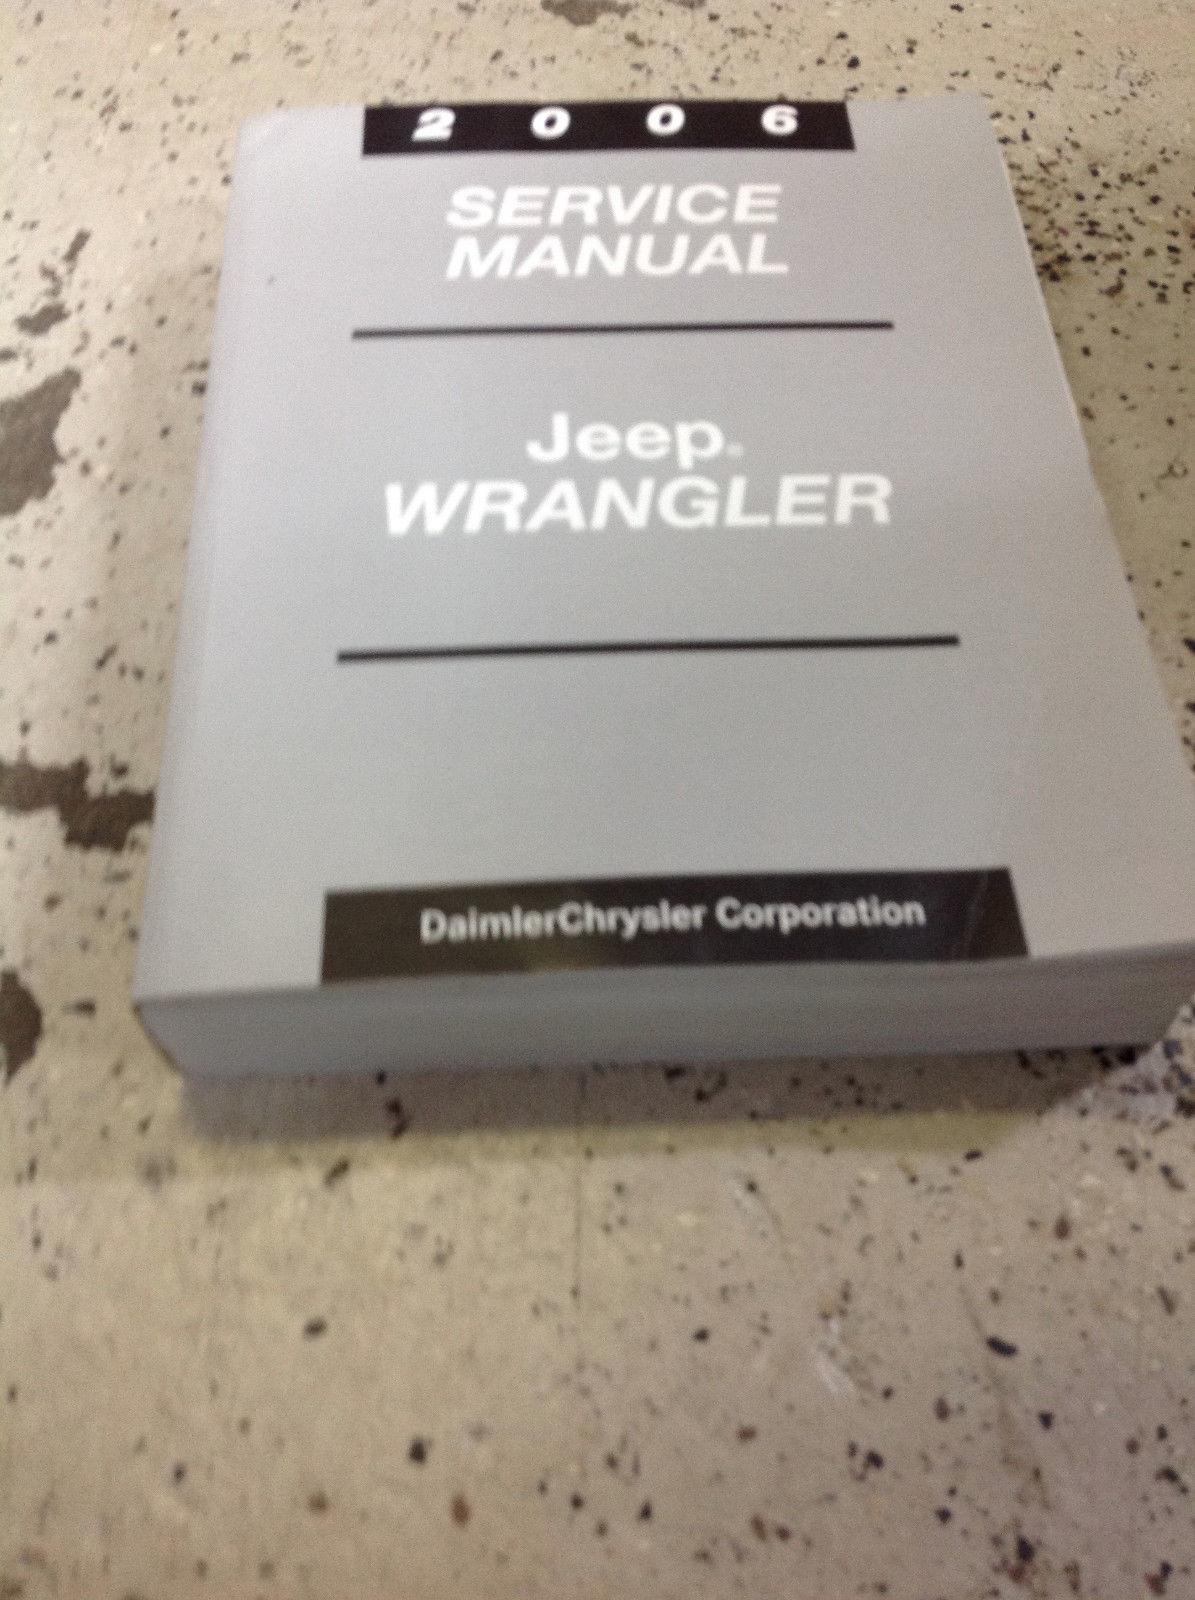 2006 JEEP WRANGLER Service Shop Workshop Repair Manual FACTORY BOOK OEM Mopar